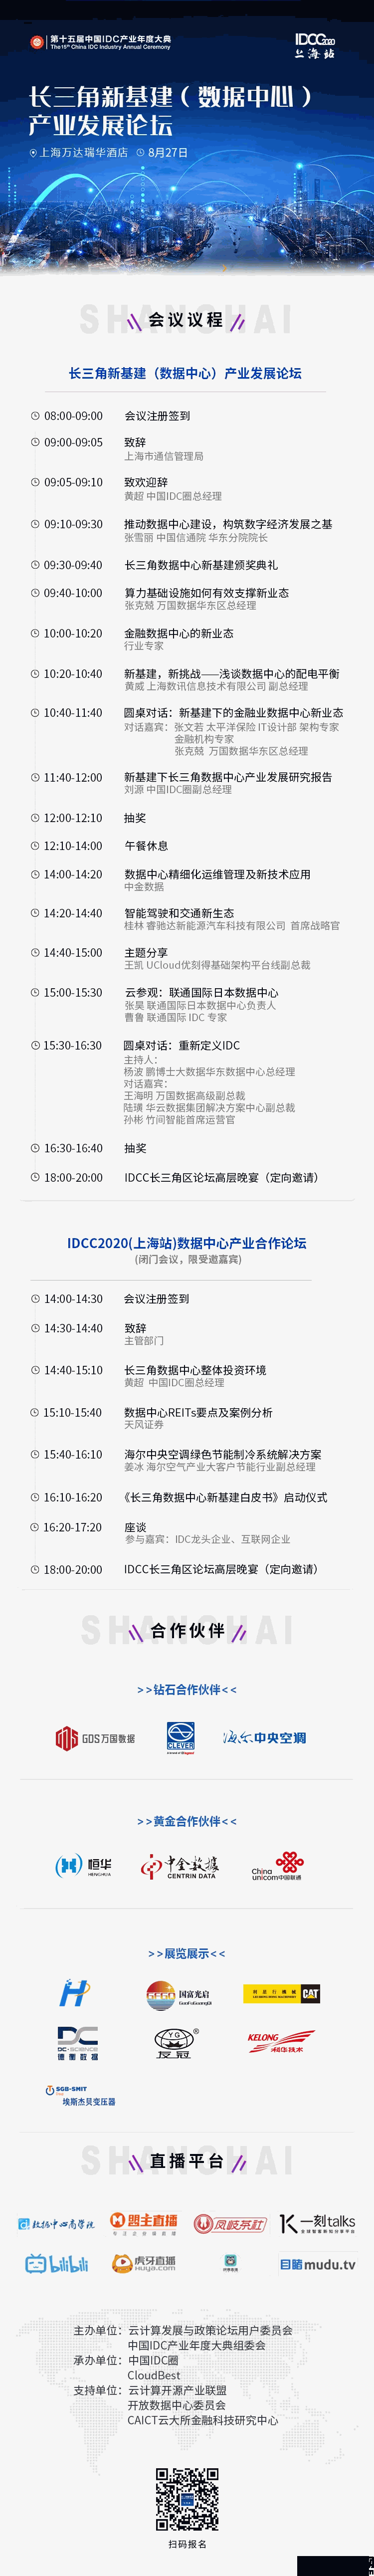 IDCC2020 上海站 长三角 议程